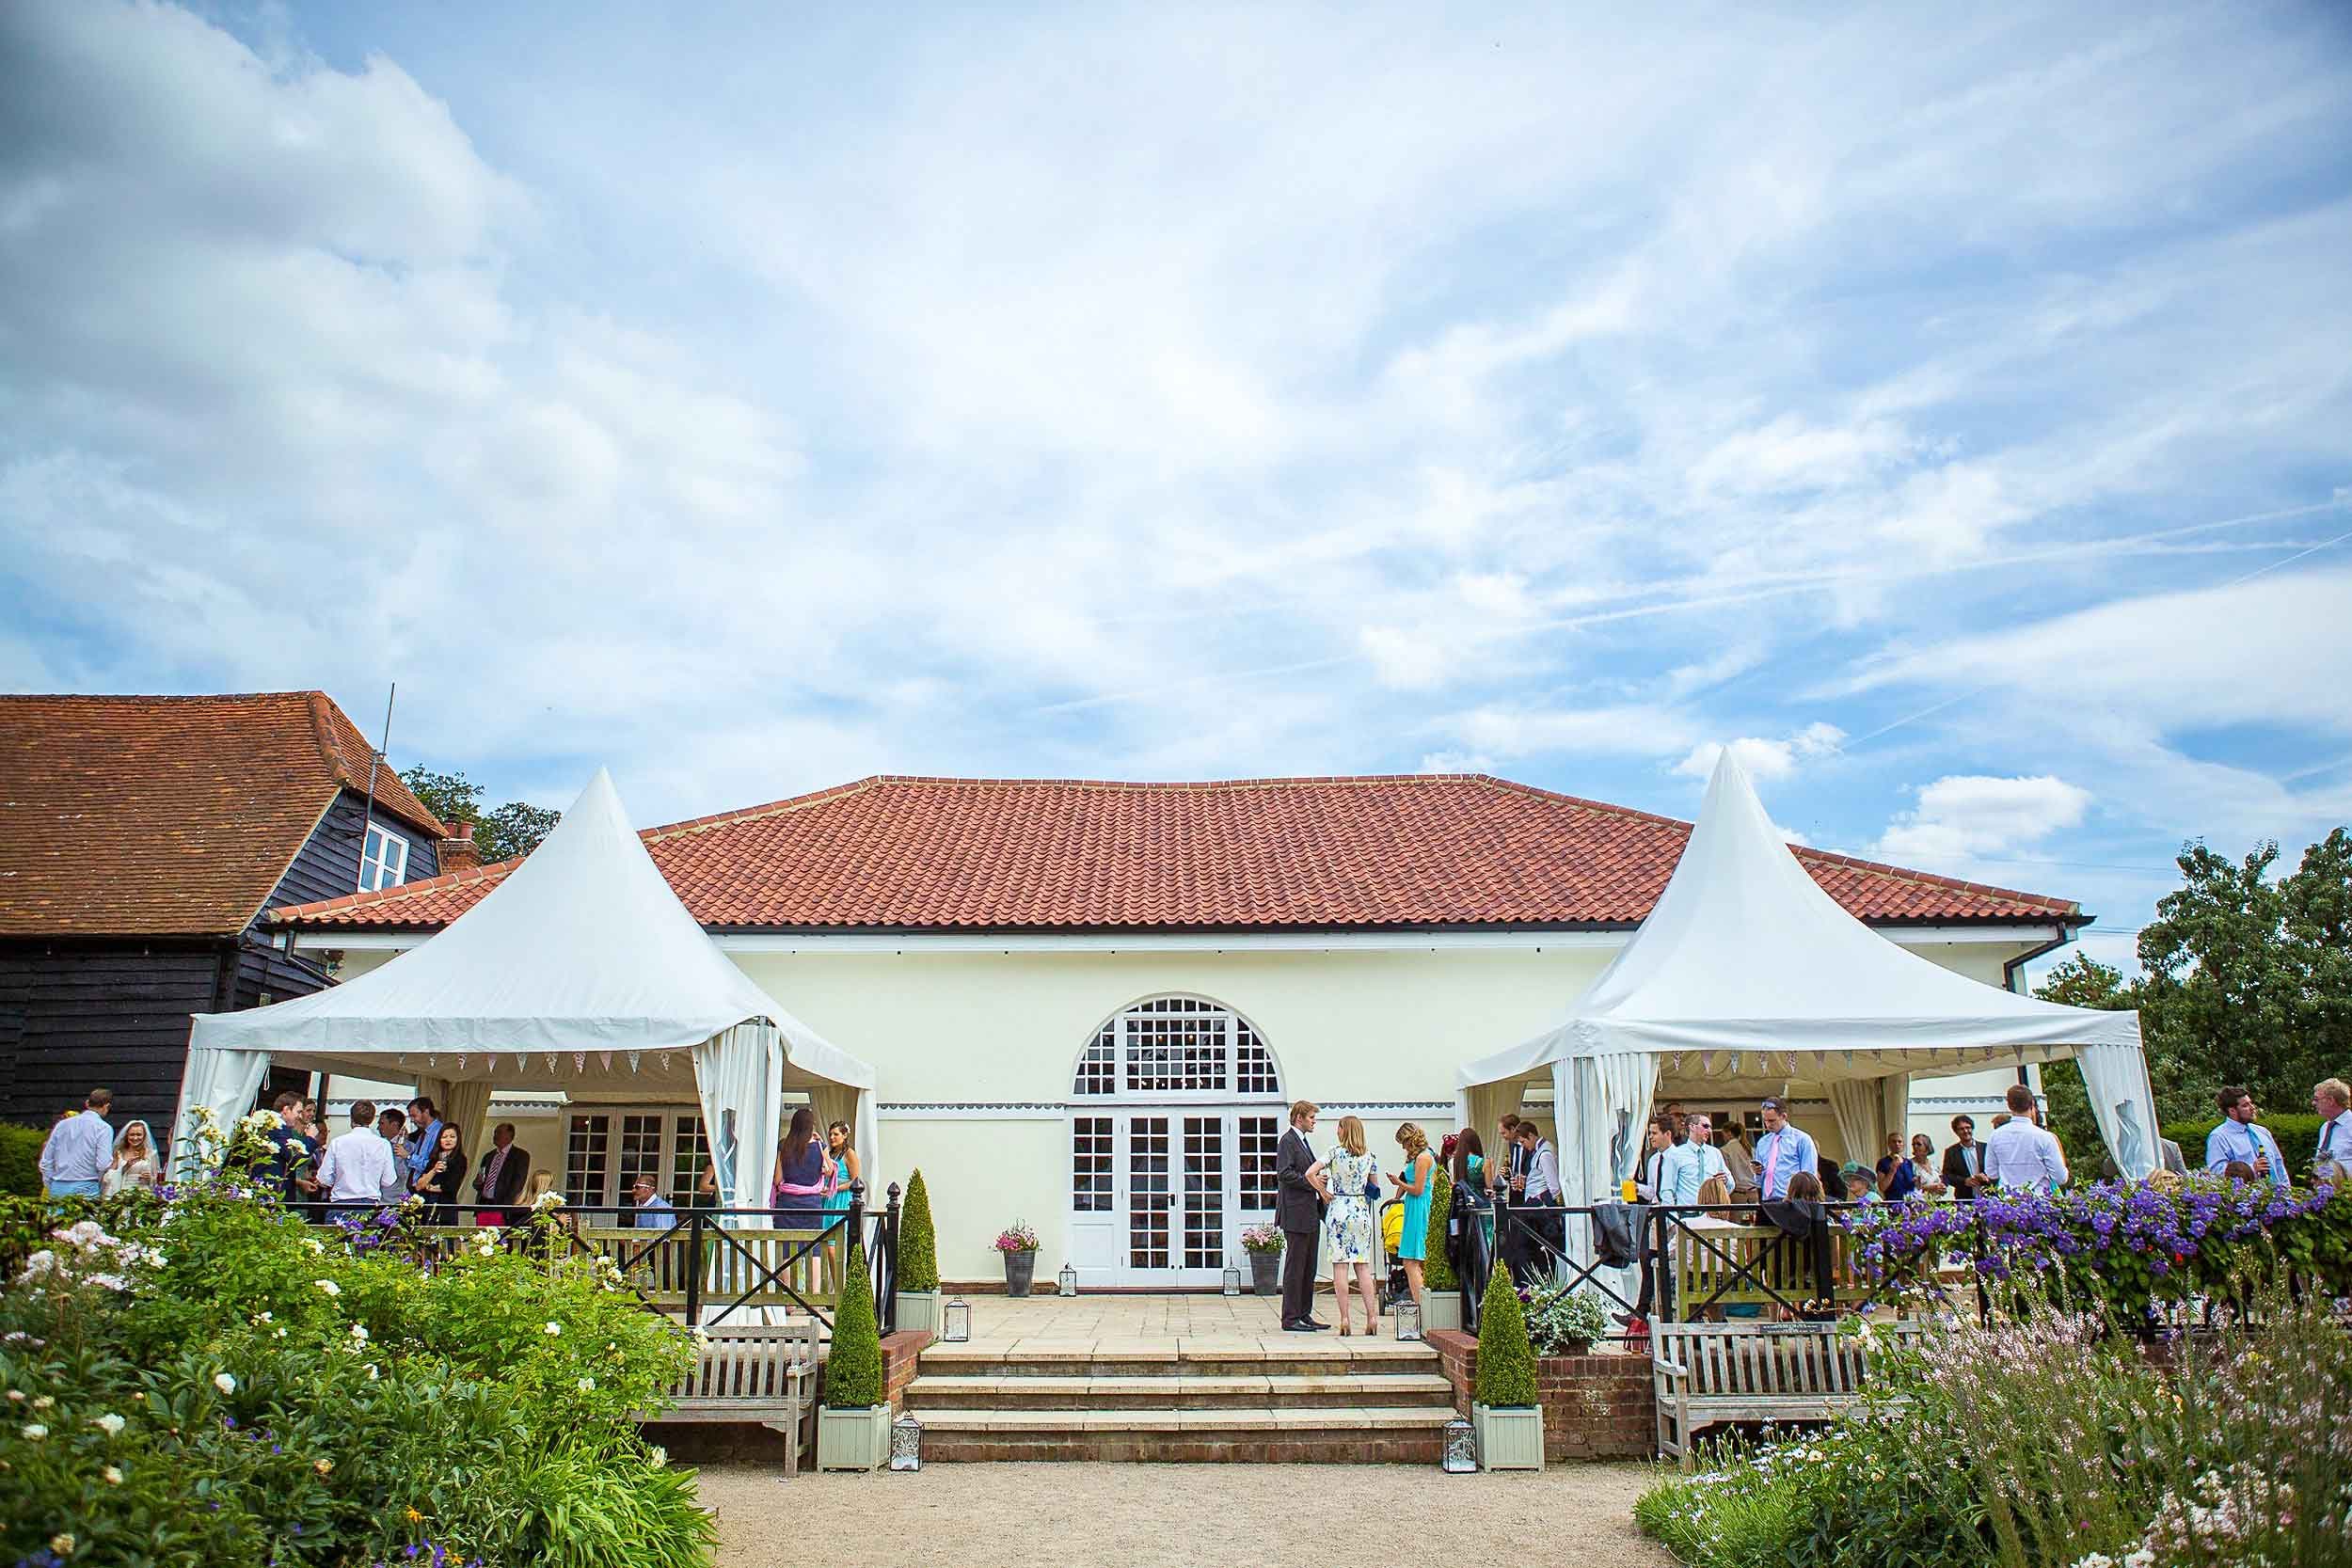 Marks-Hall-Wedding-Photographer-37.jpg